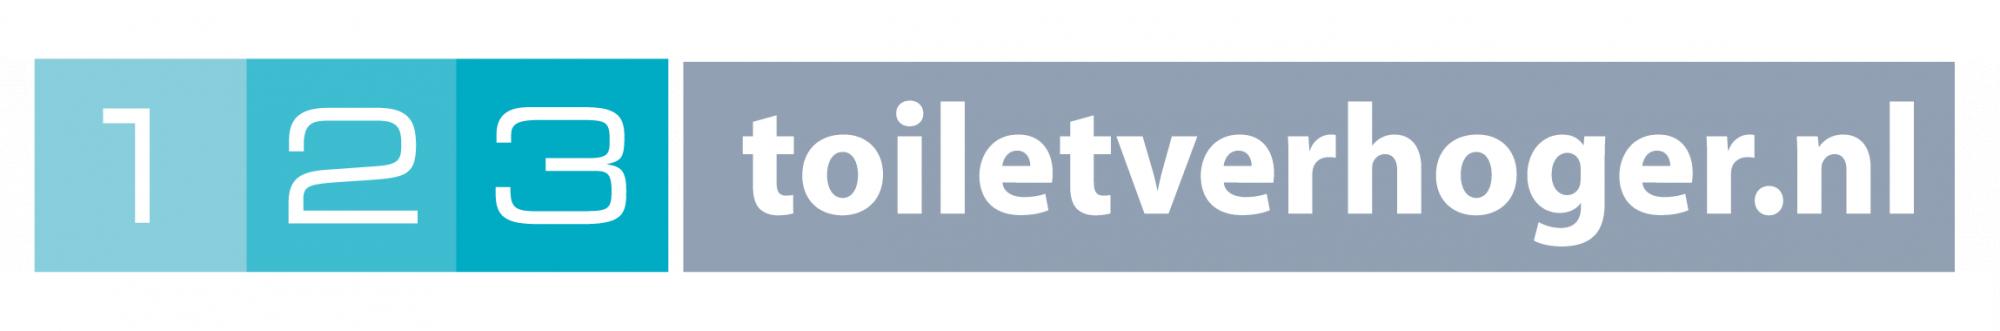 logo van 123Toiletverhoger.nl